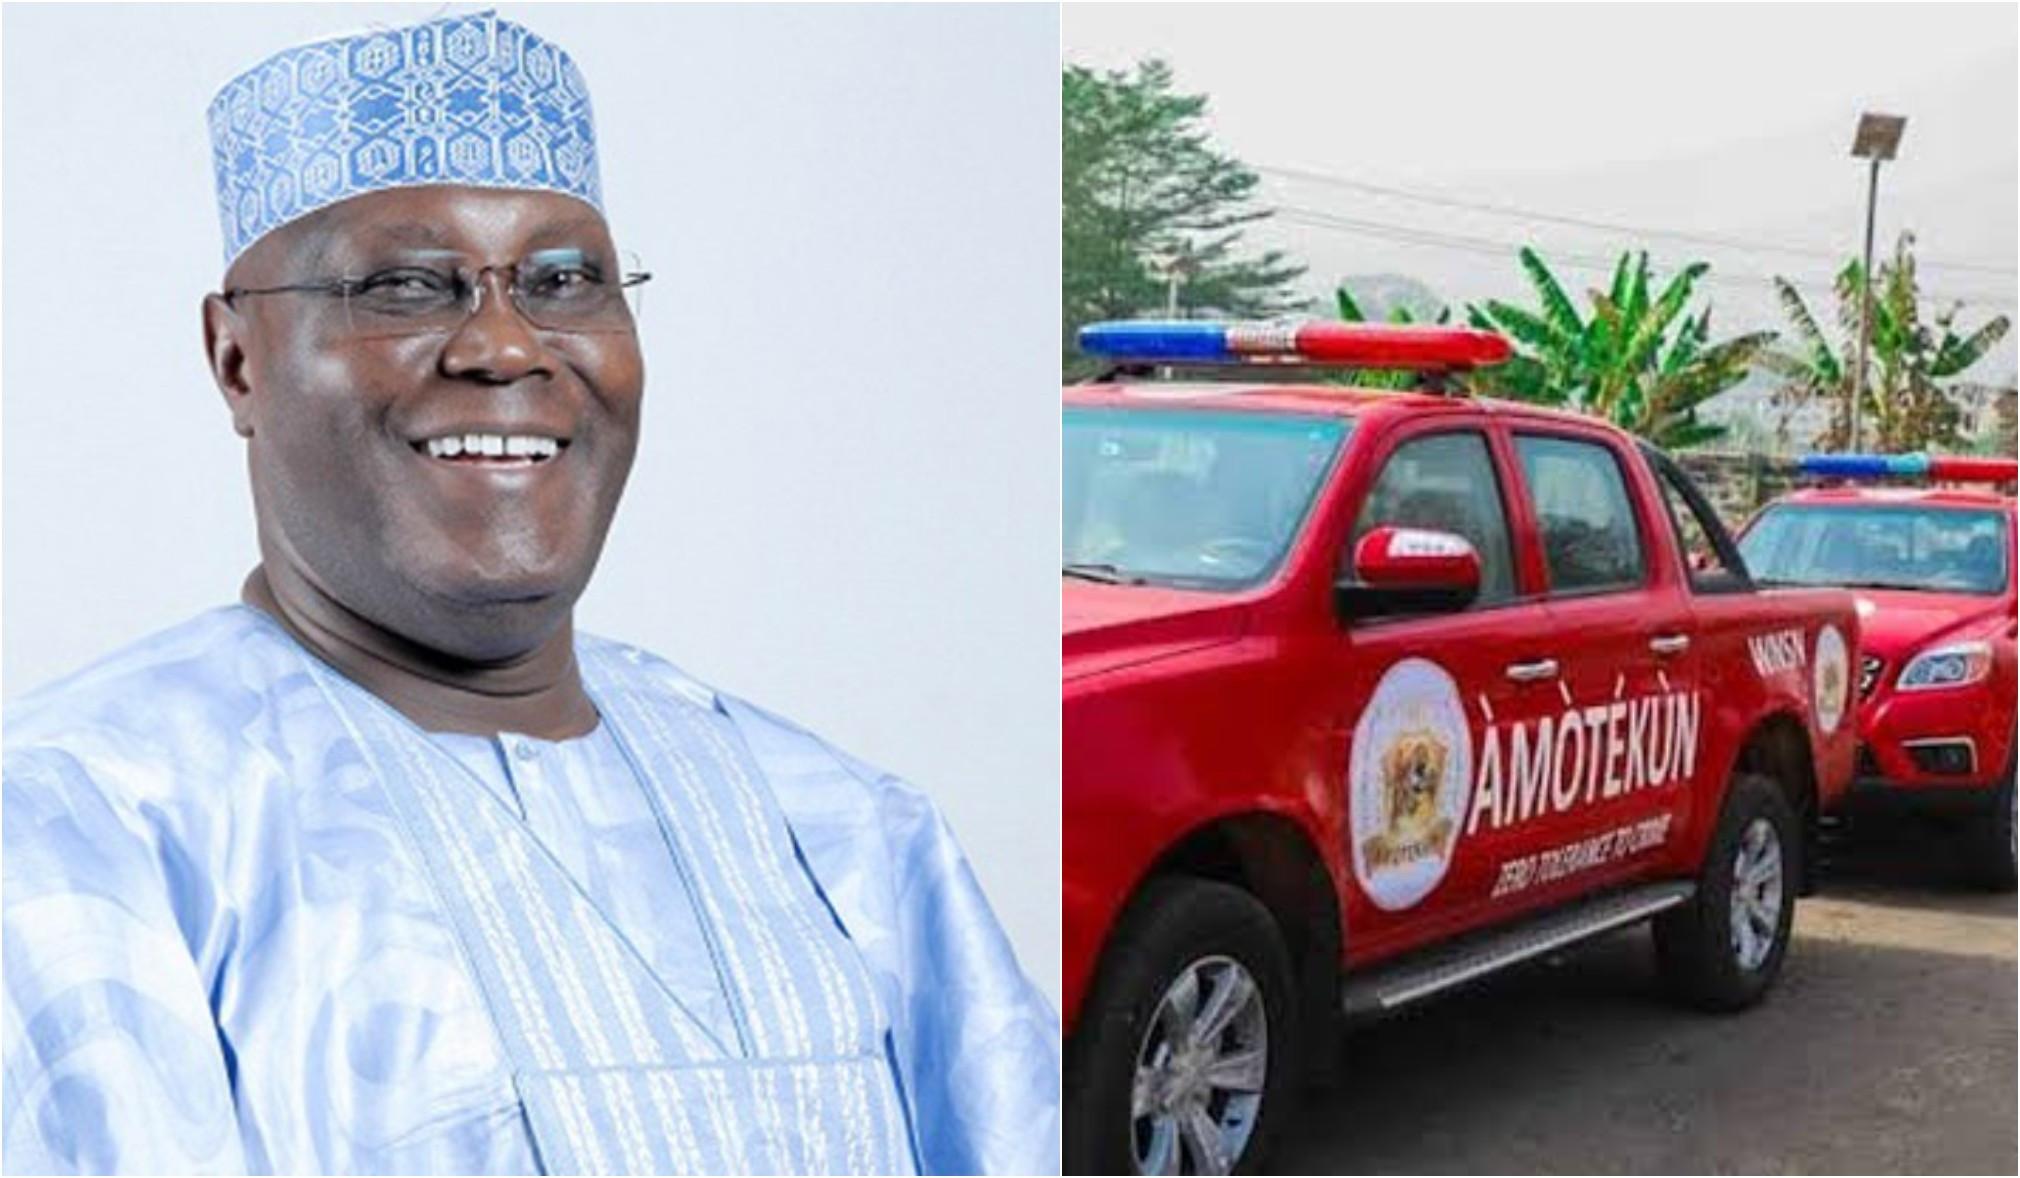 Atiku Abubakar supports establishment of Amotekun